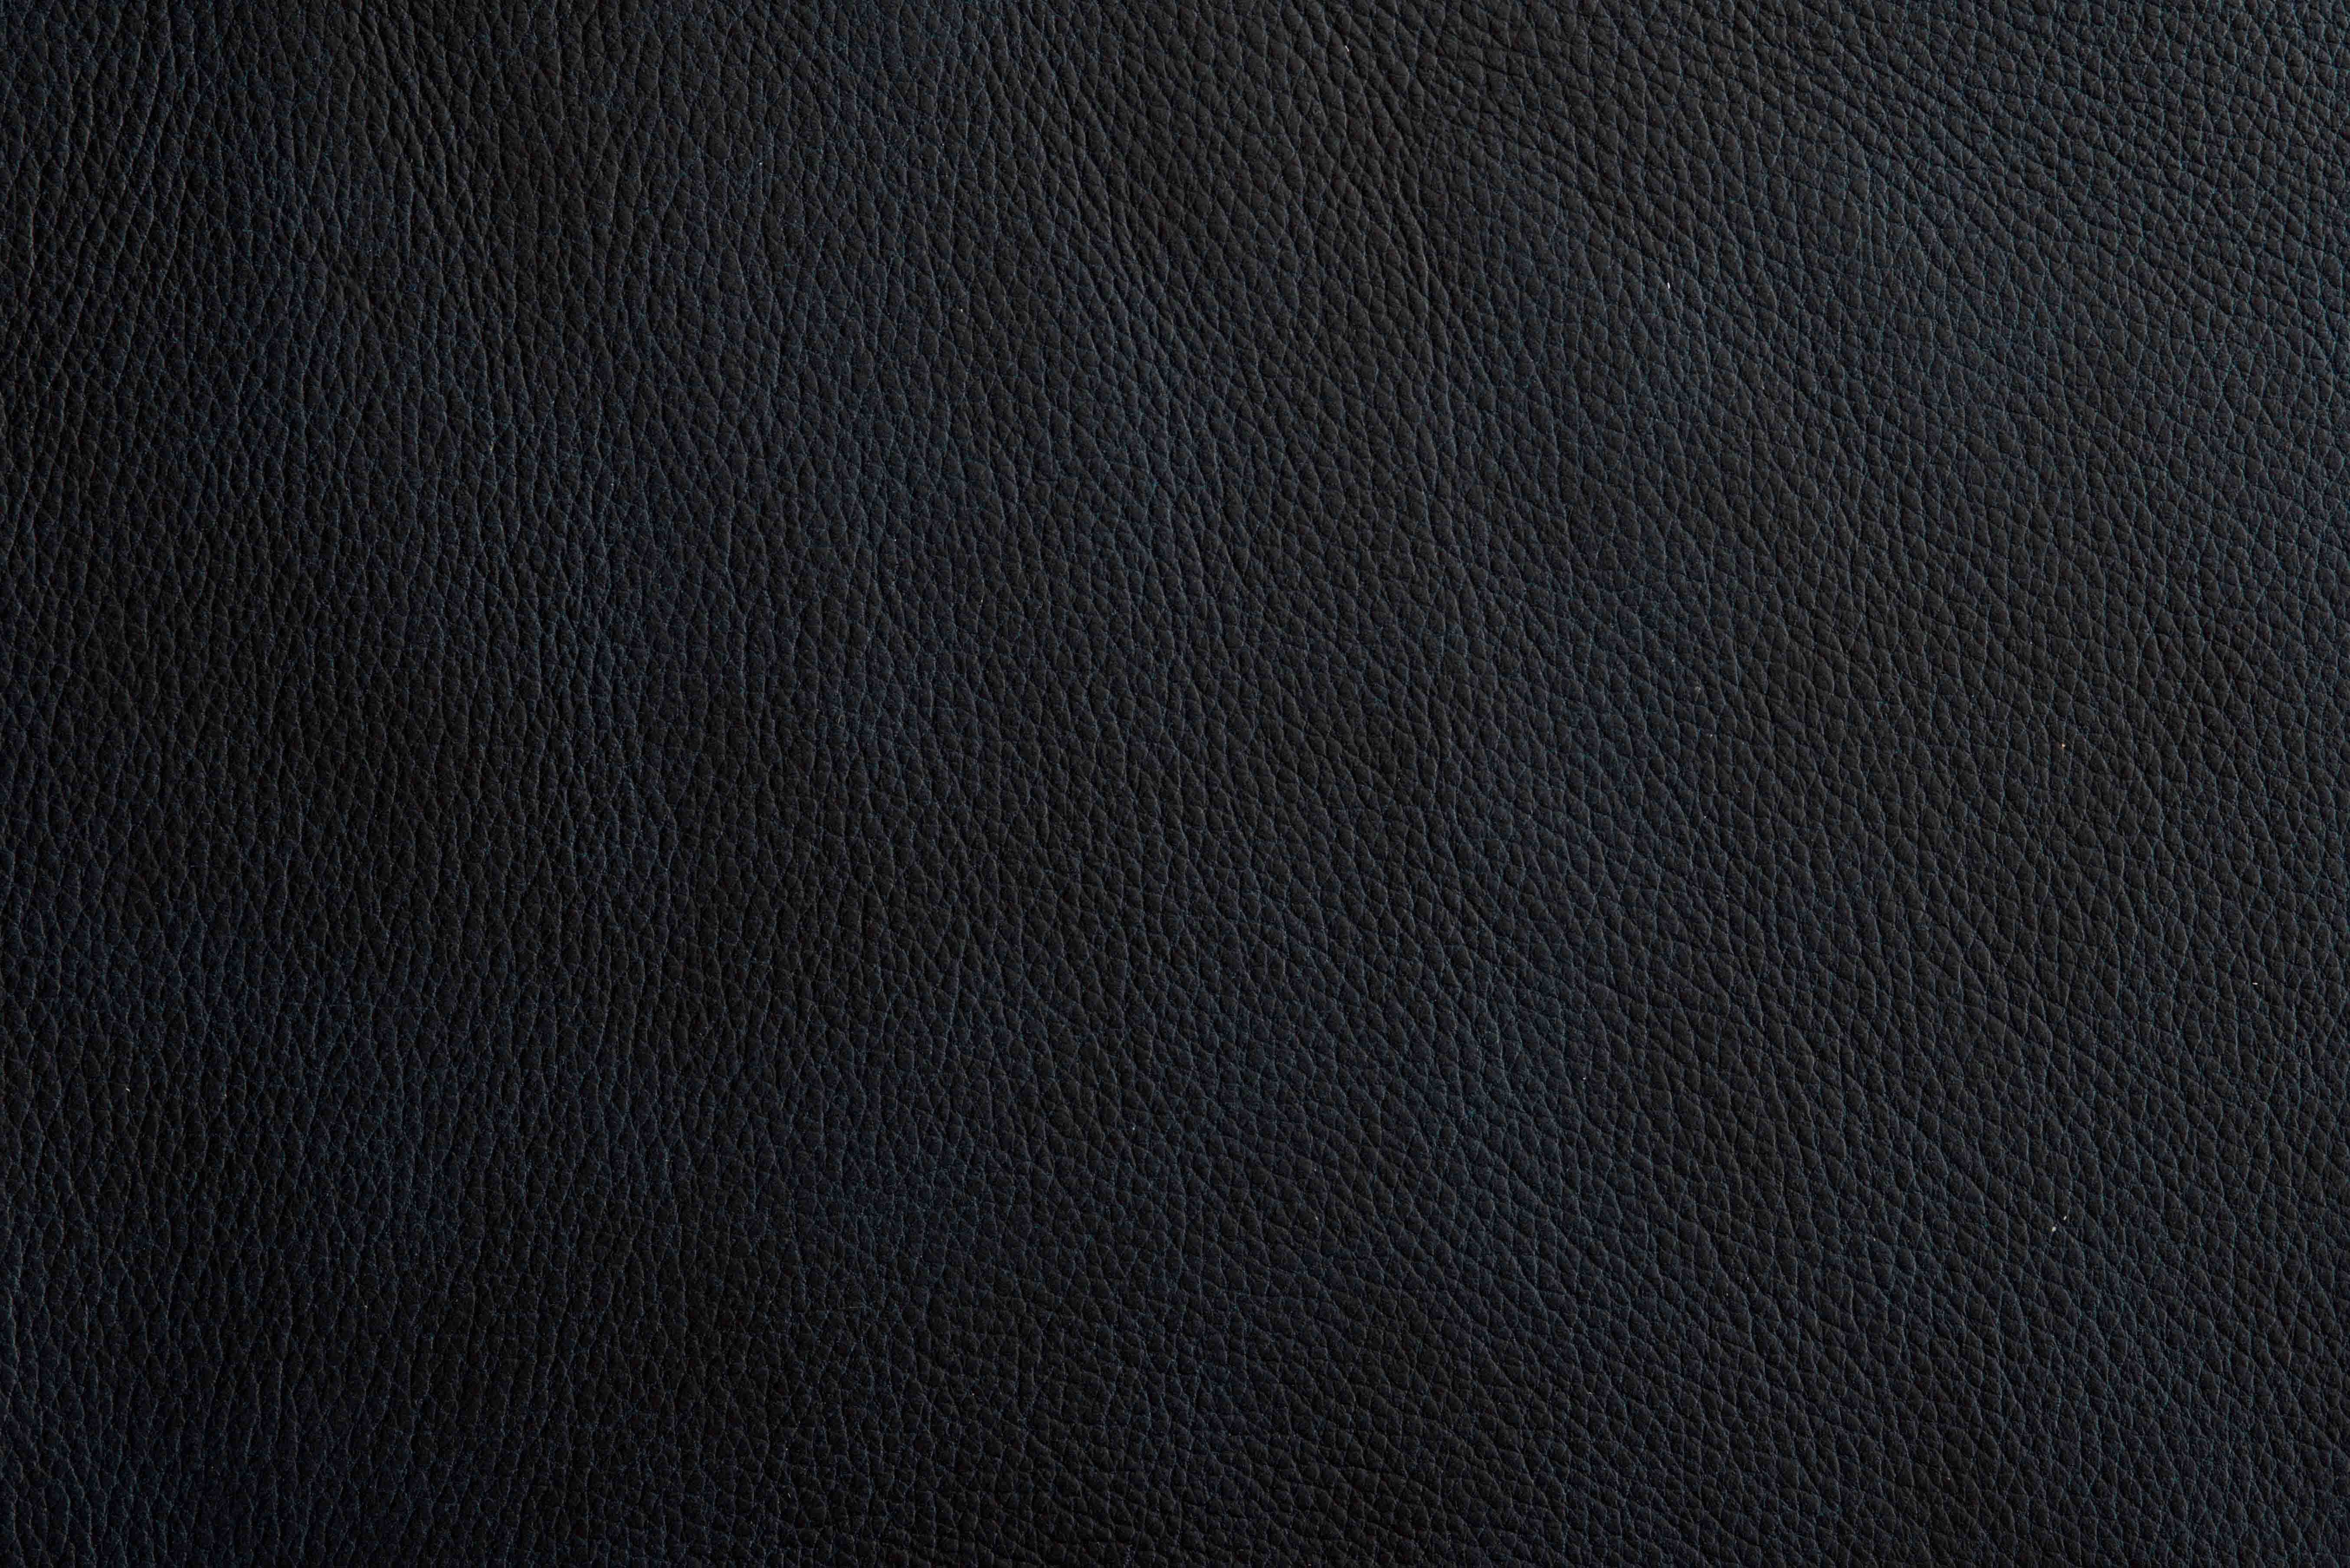 9167B DARKBLUEの素材拡大画像